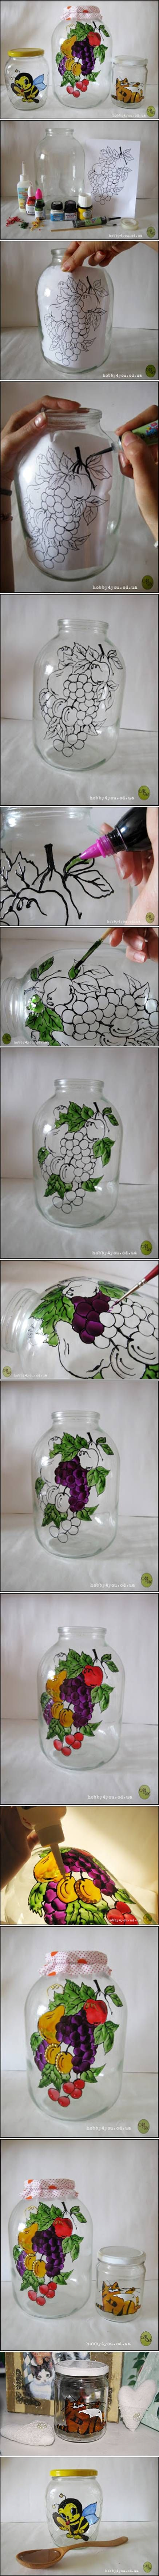 DIY Jar Painting Decor DIY Projects / UsefulDIY.com